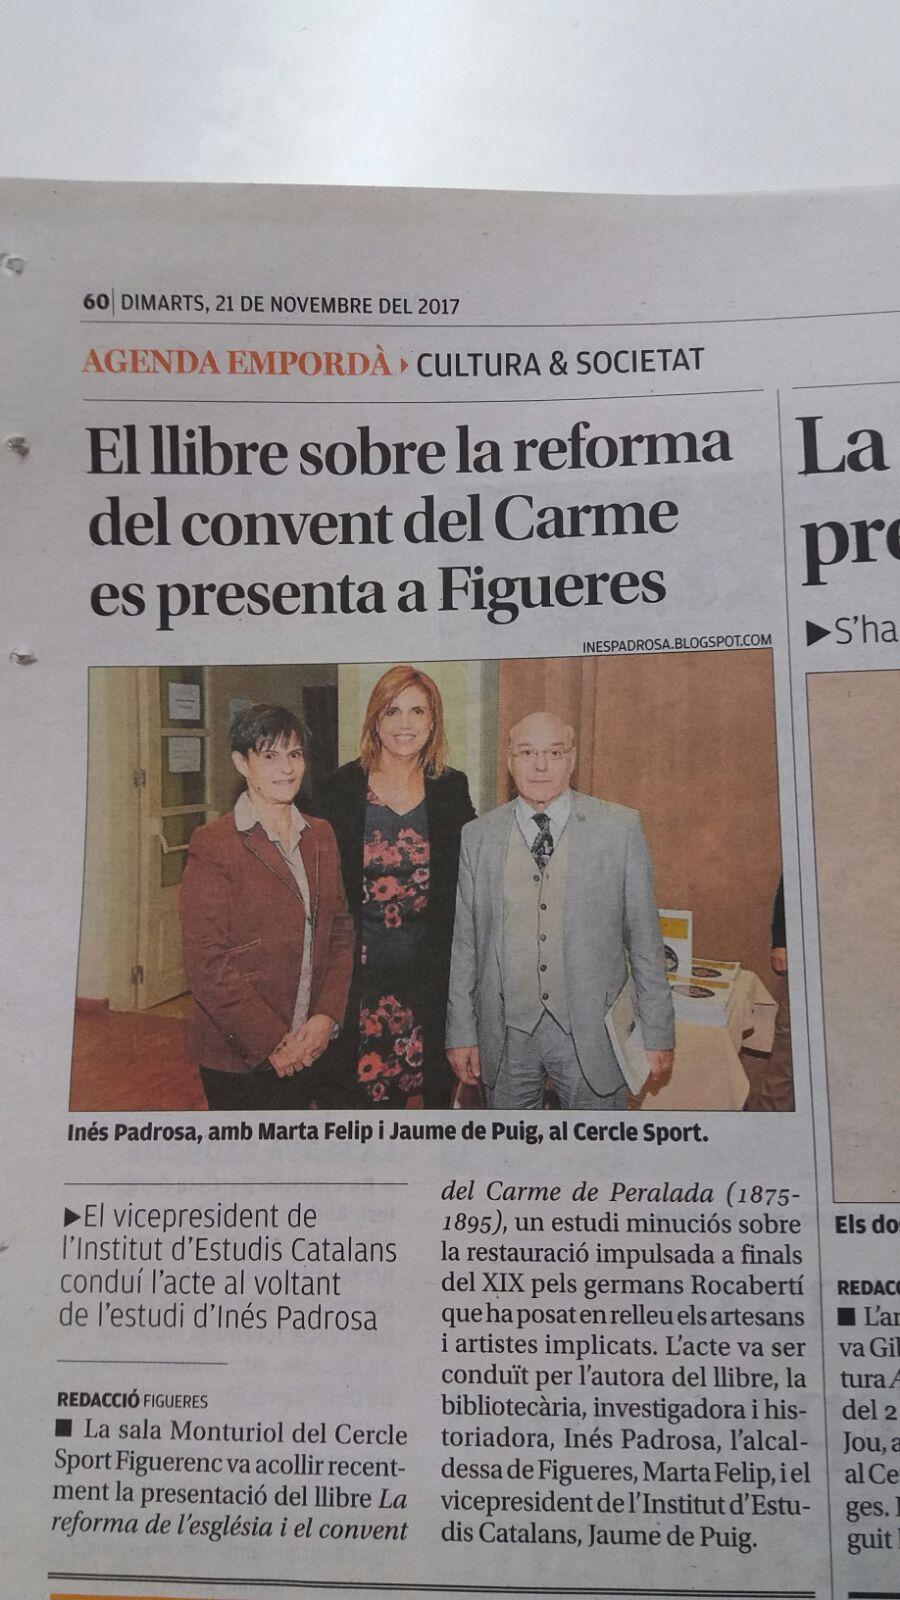 la reforma del convent del Carme